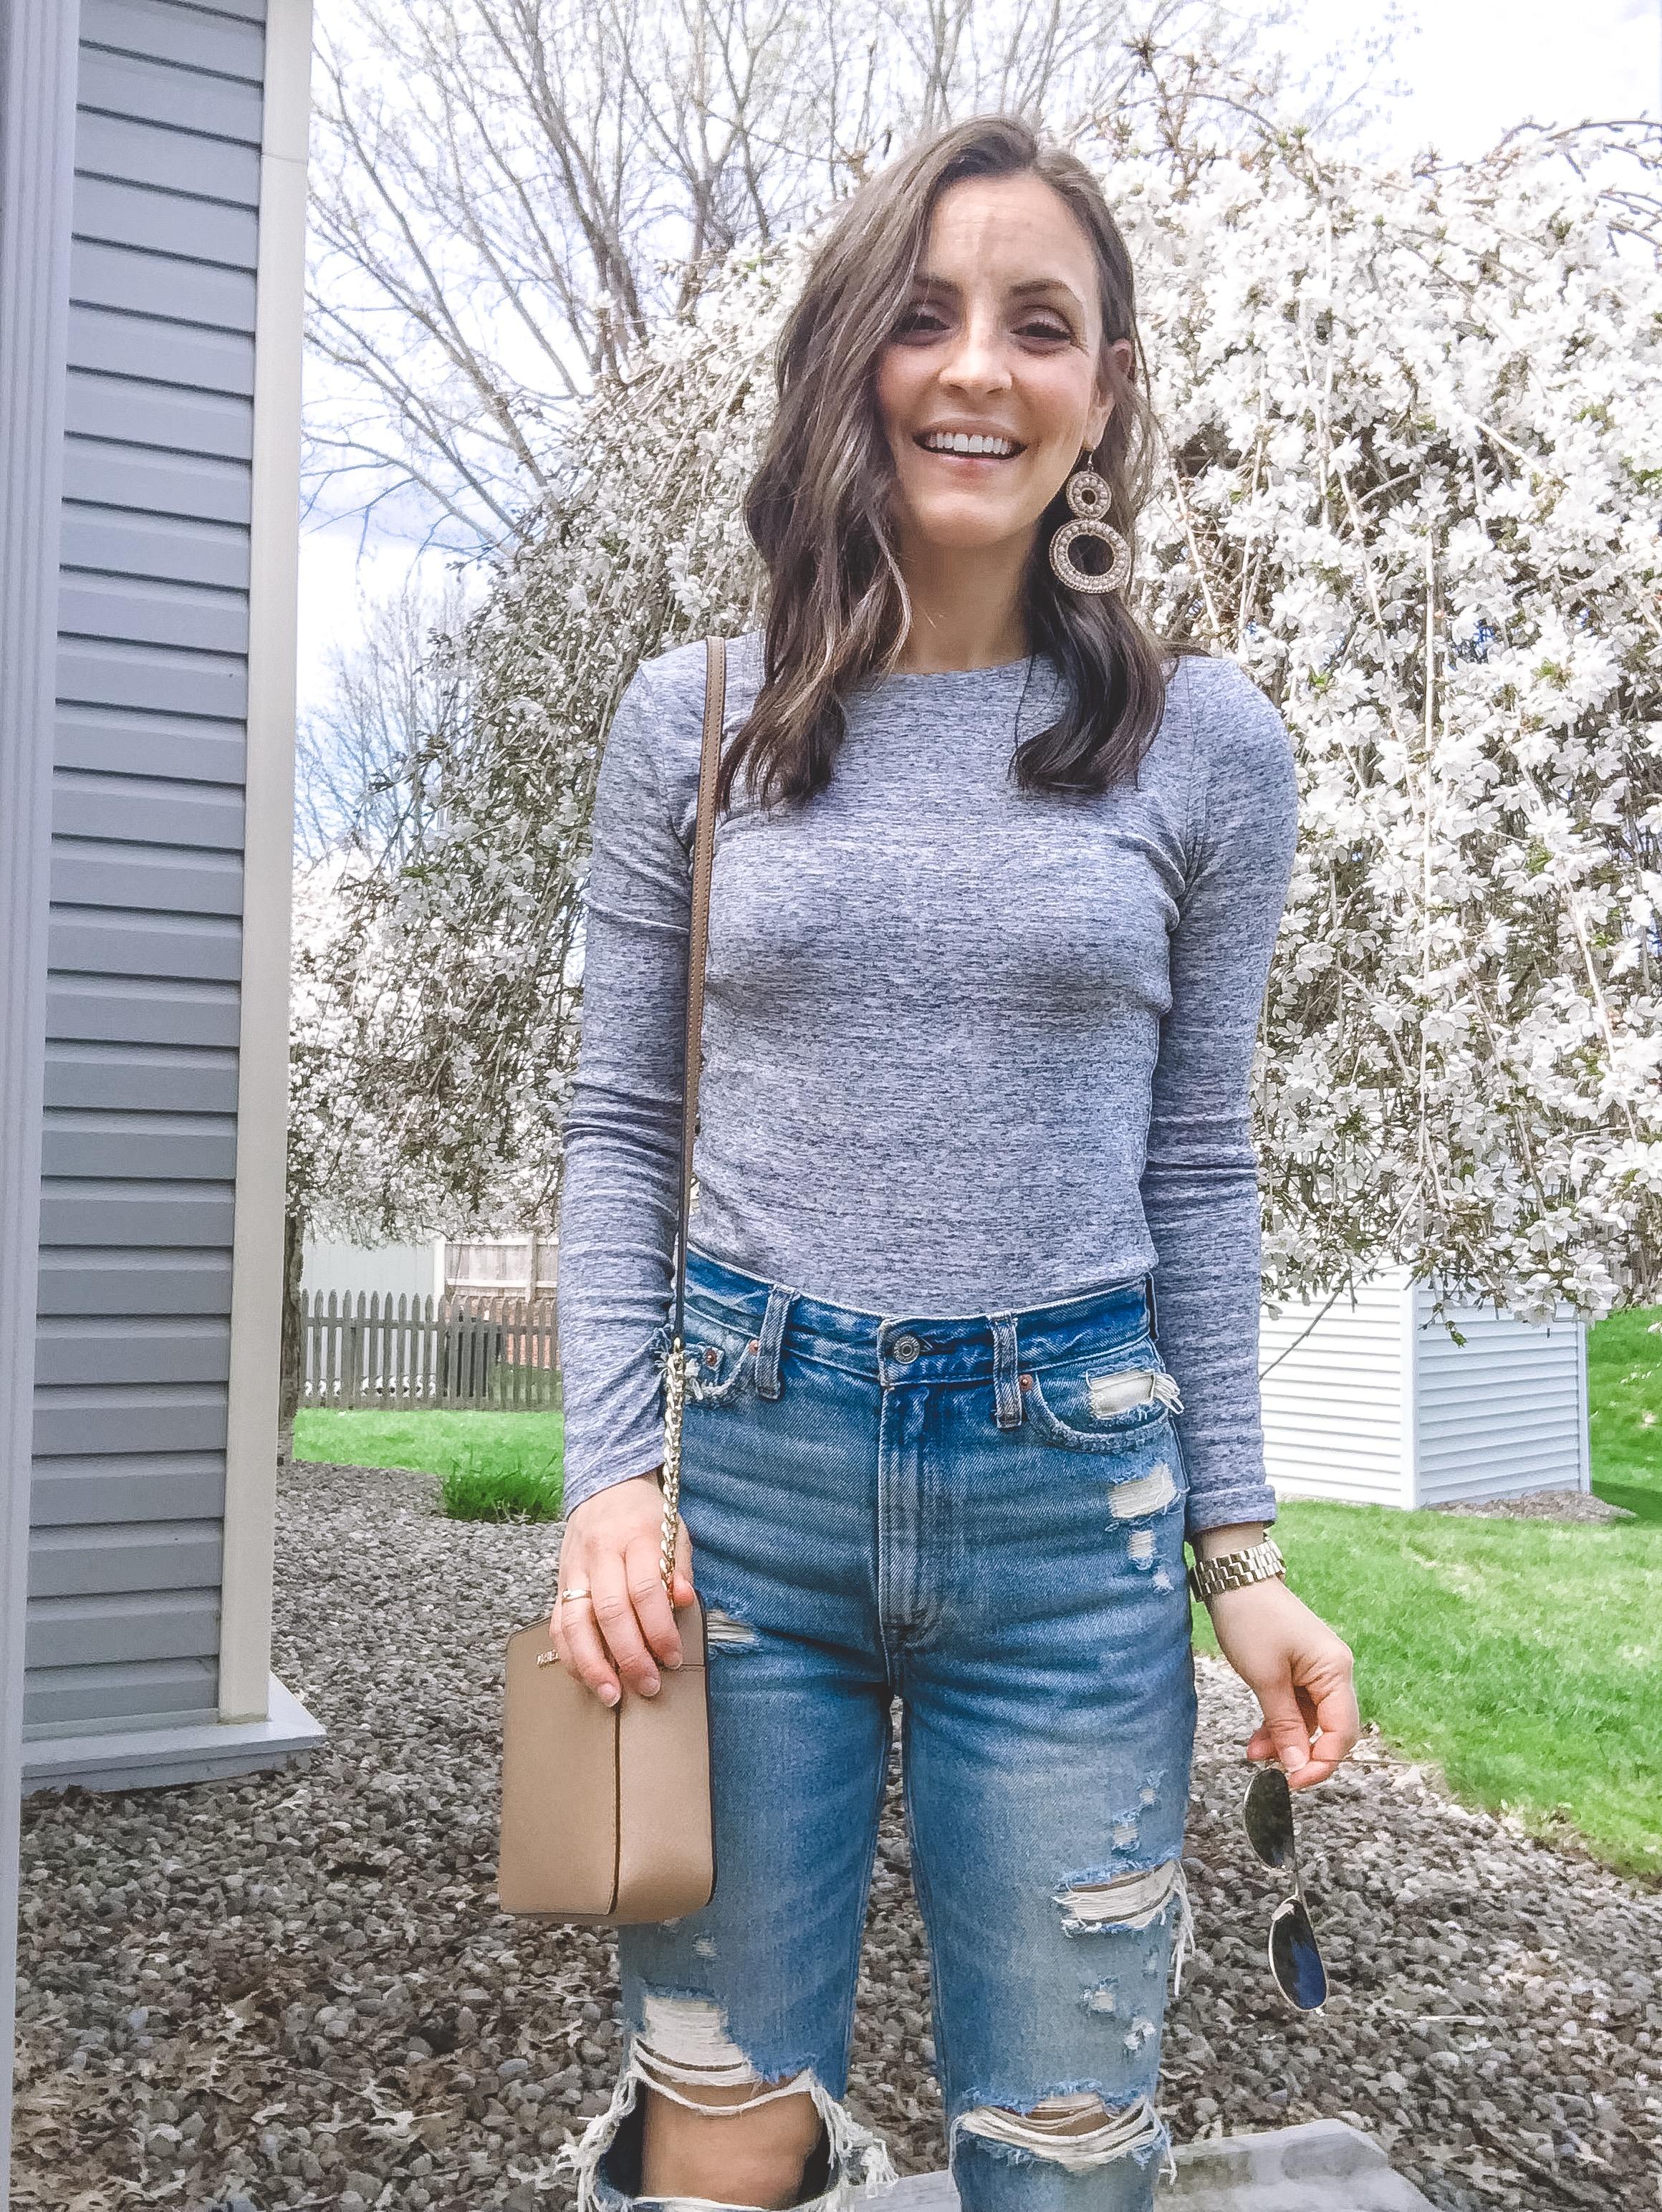 Sephora's Beauty Insider Spring Bonus Event -- The Life She Wanders